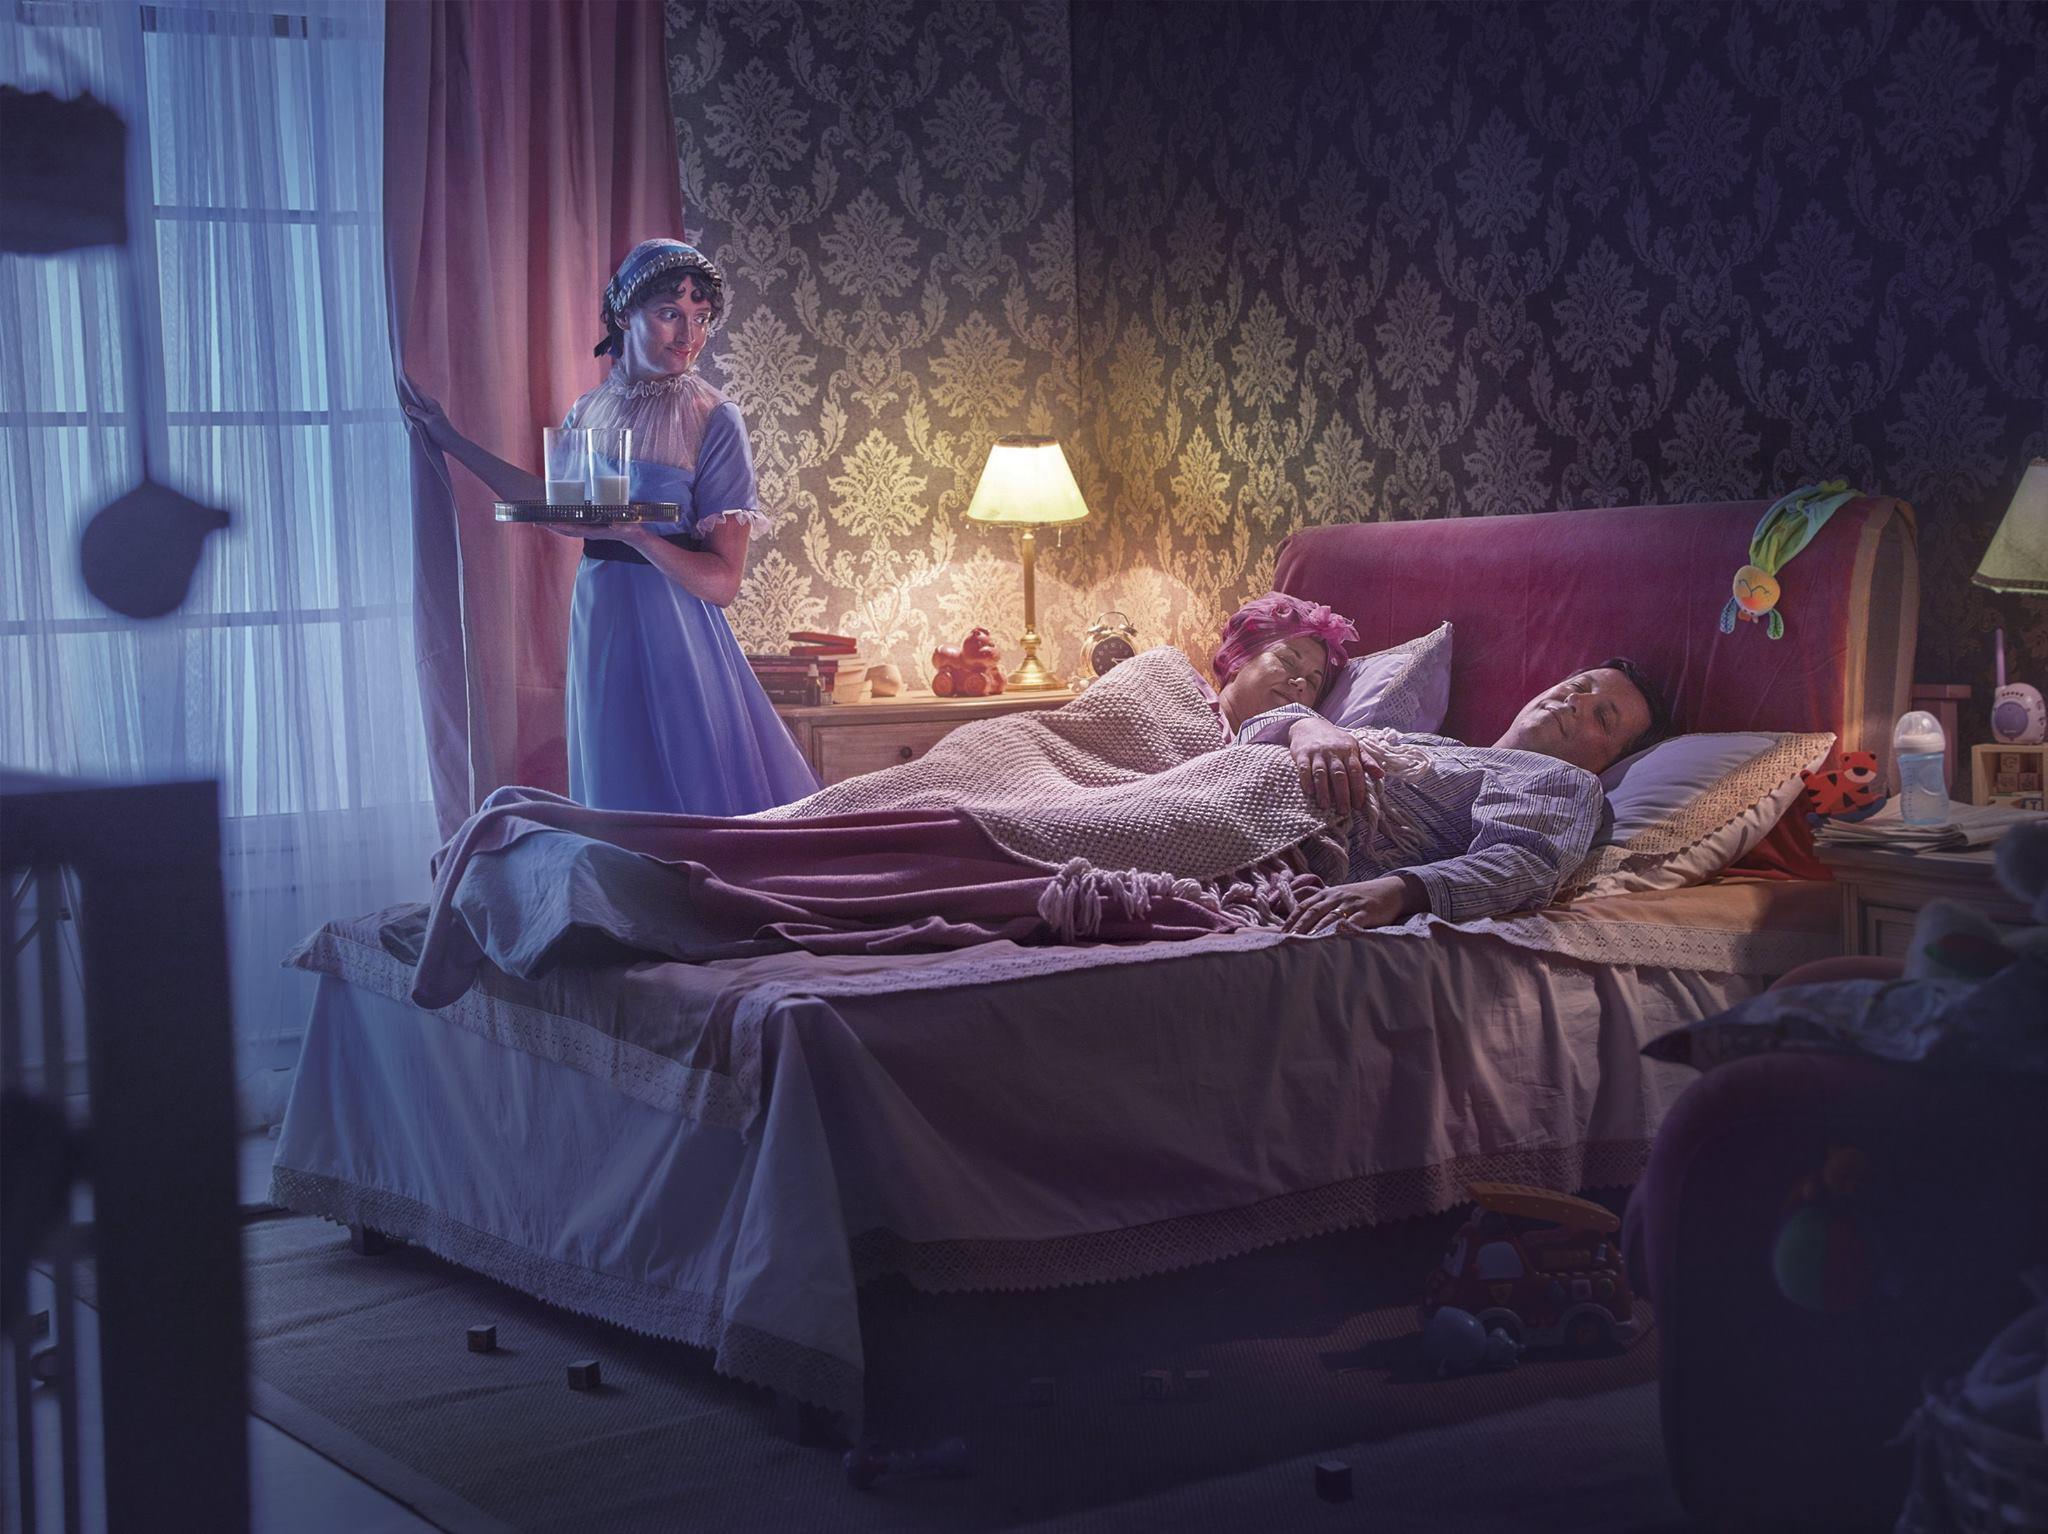 novels help sleep you better campaign – Dubai _2